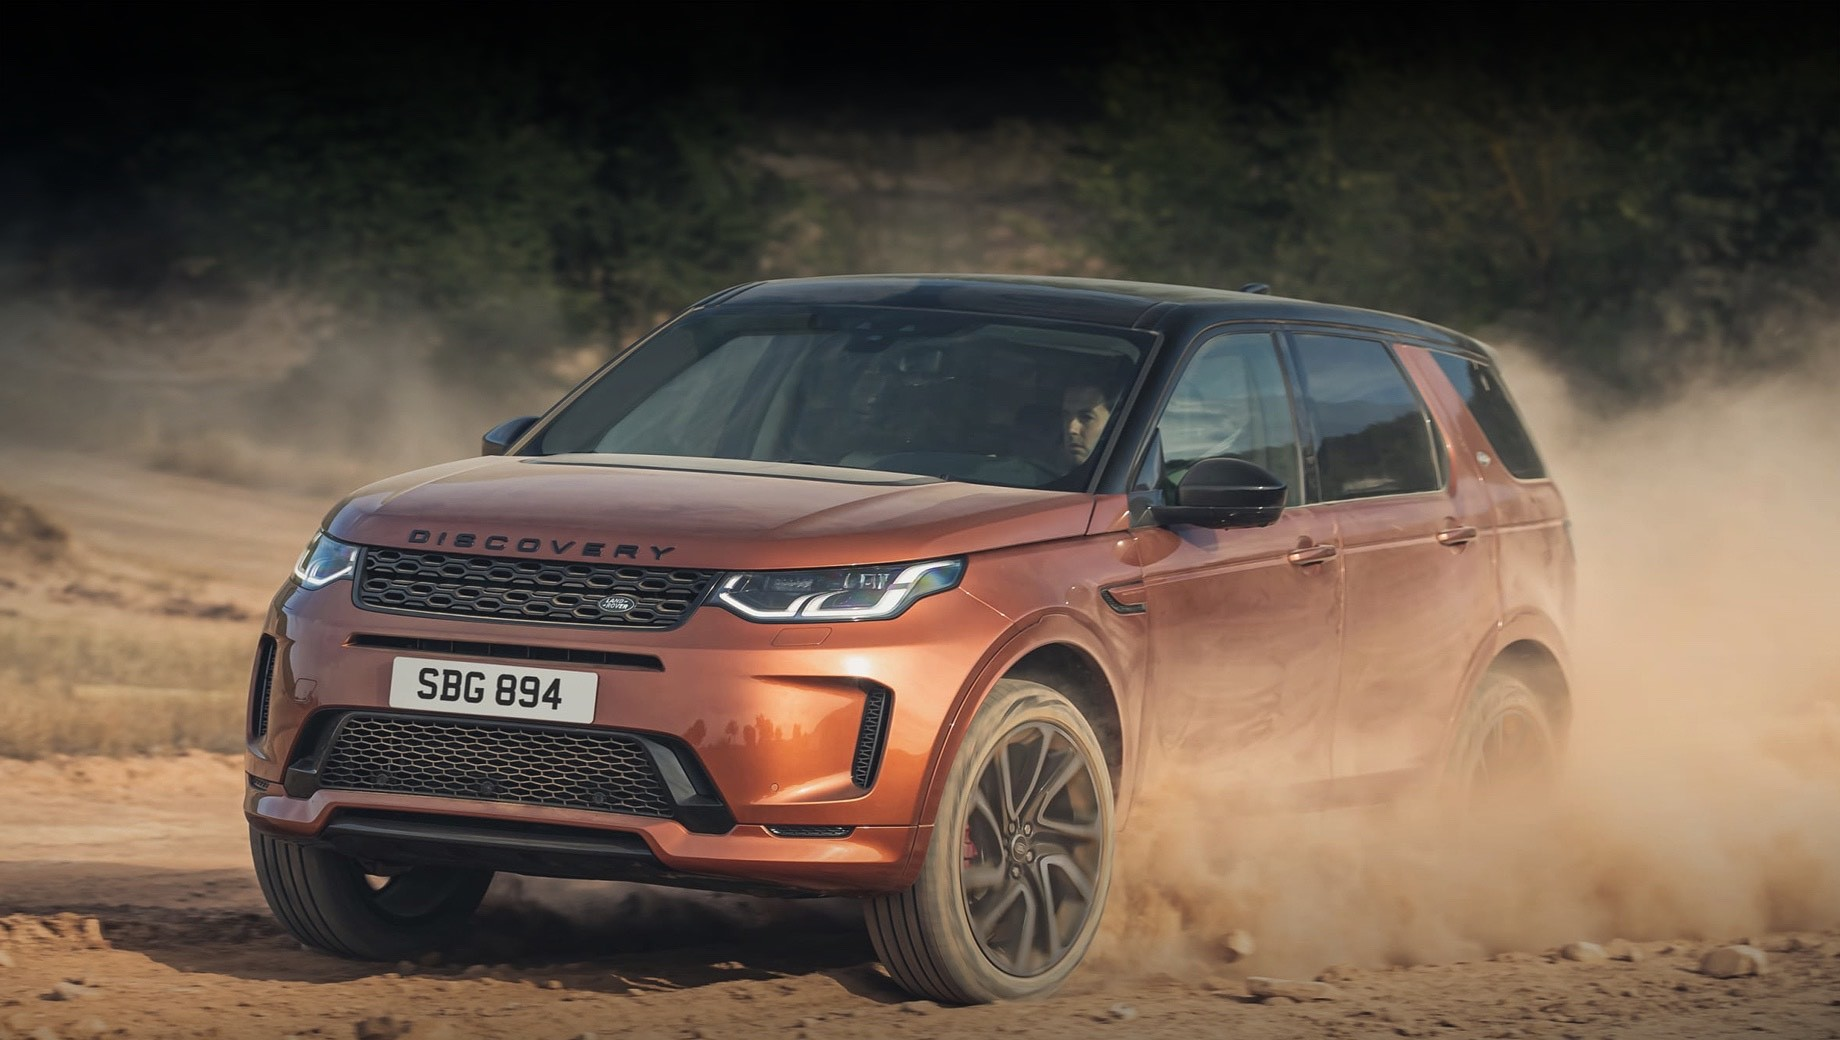 Land Rover Discovery Sport получил улучшенные дизели